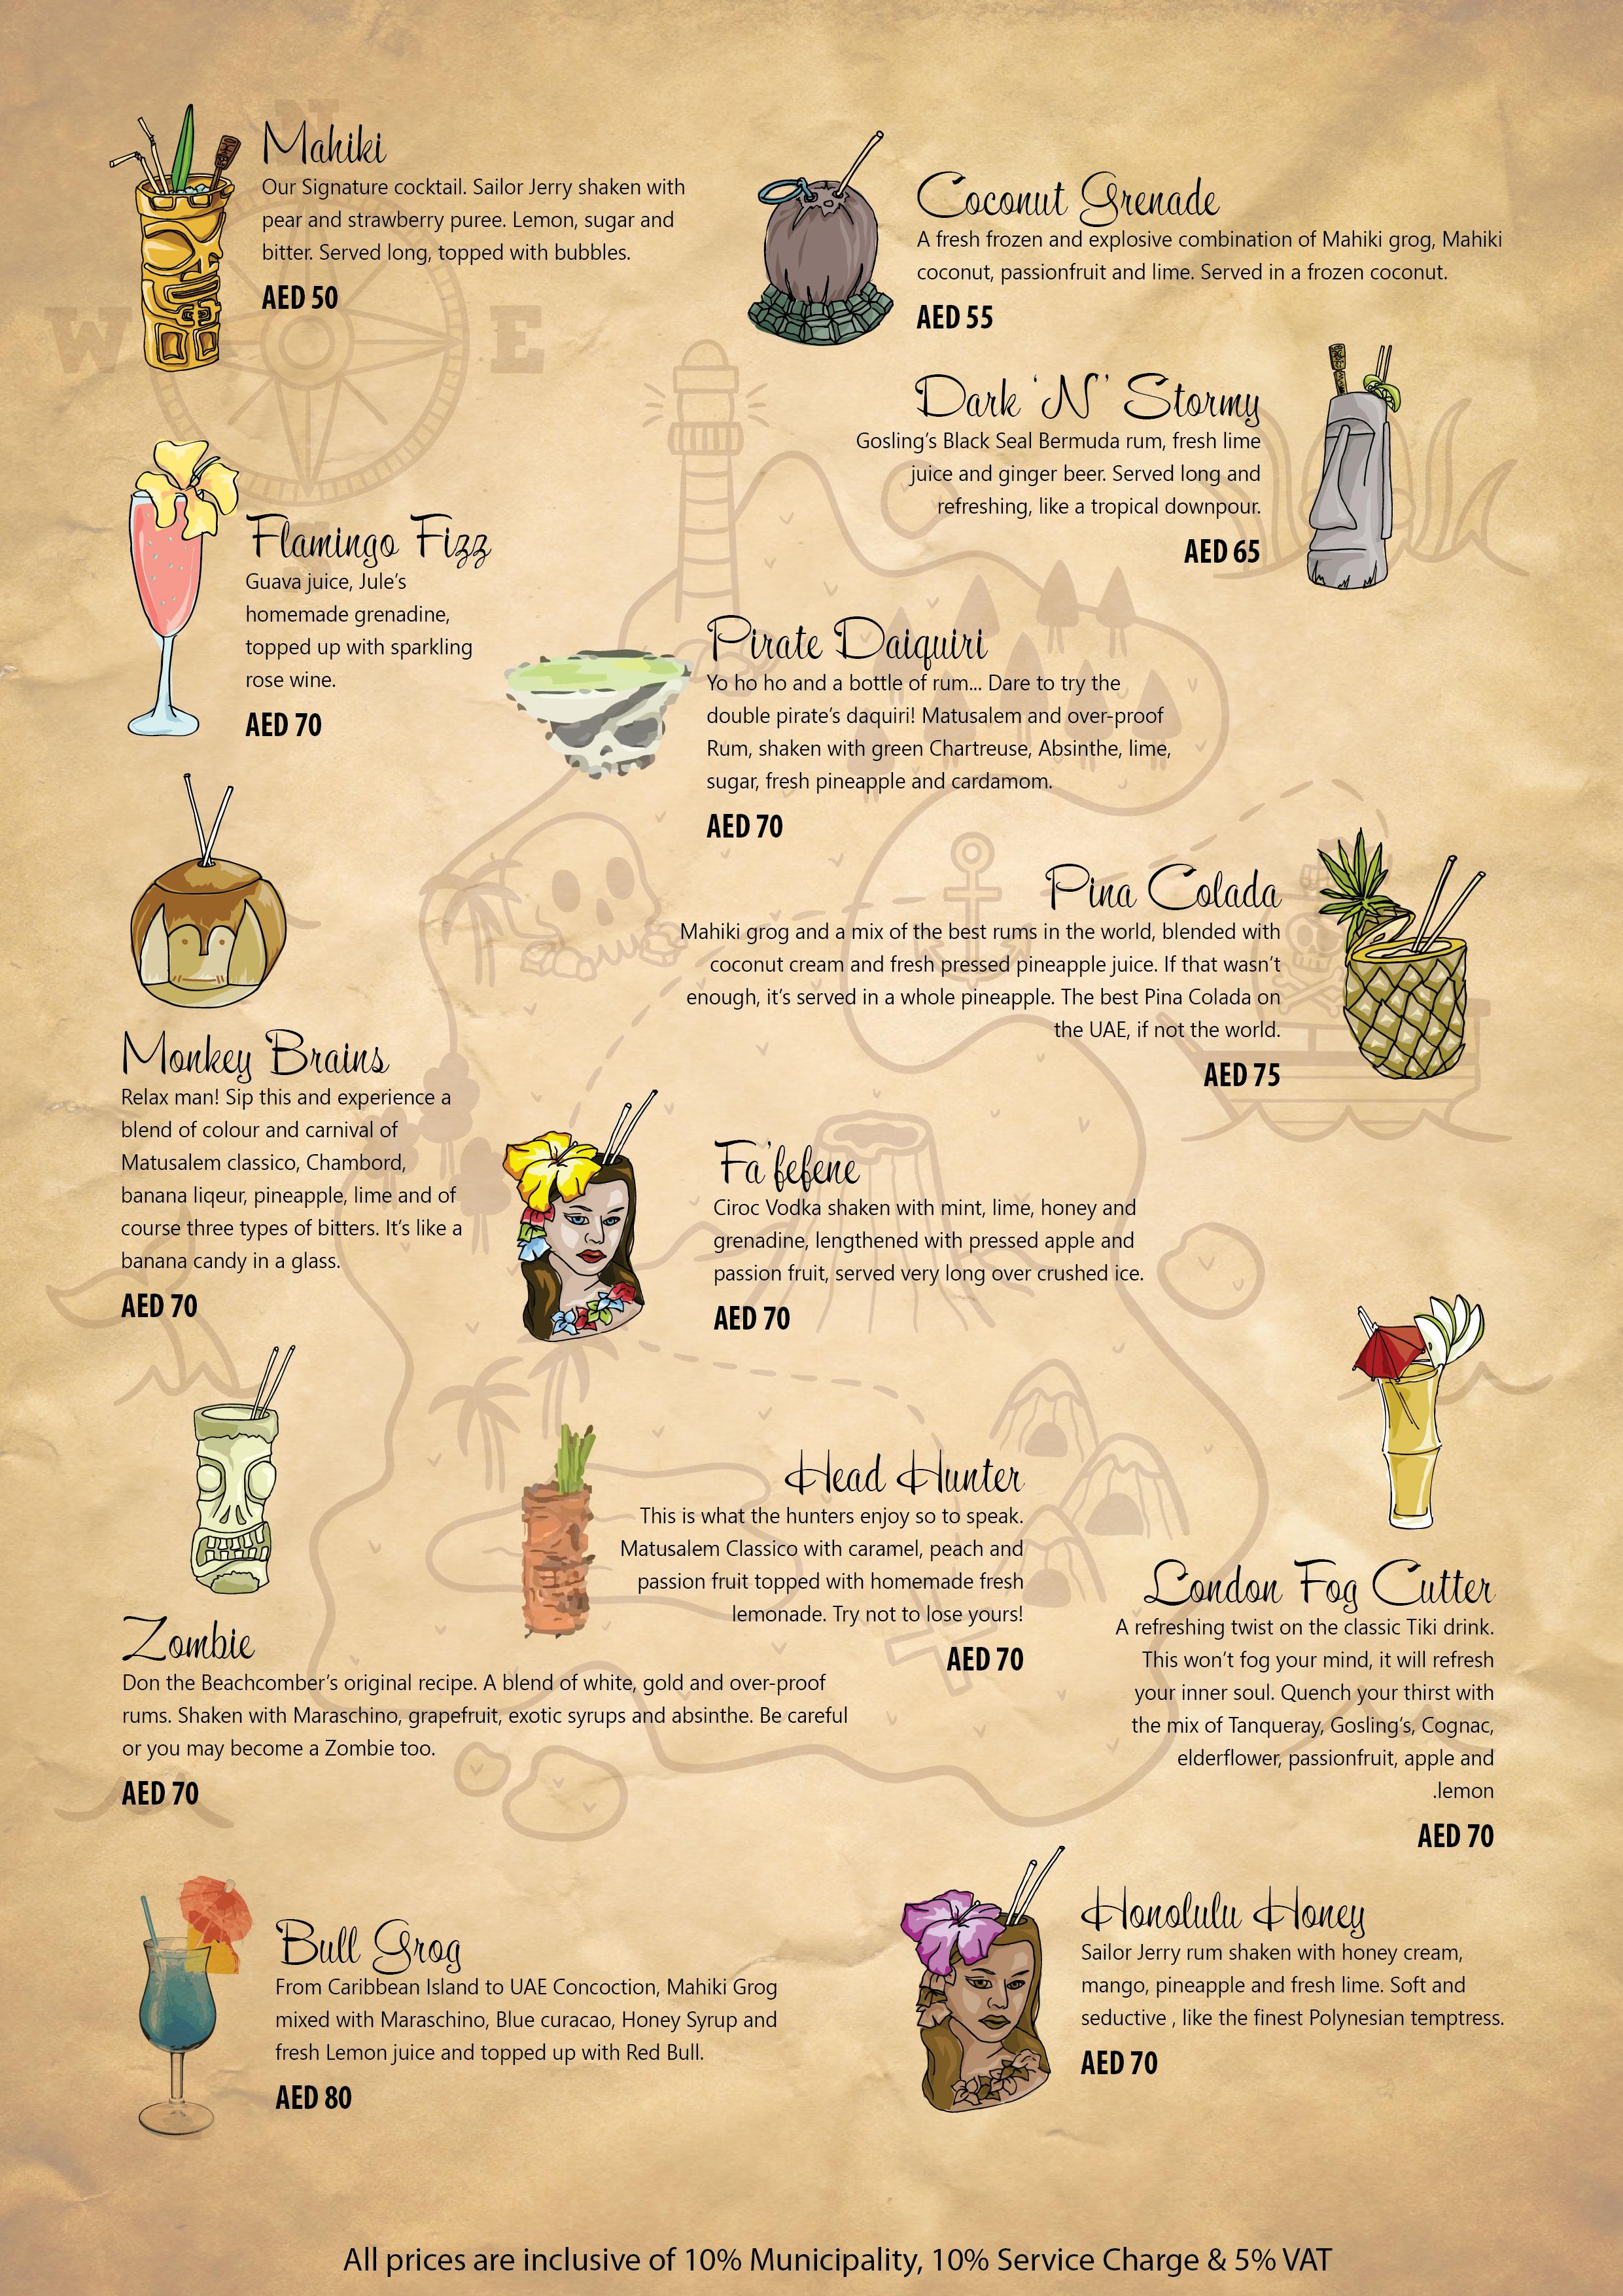 mahiki-drinks-menu_18-12-2017-02